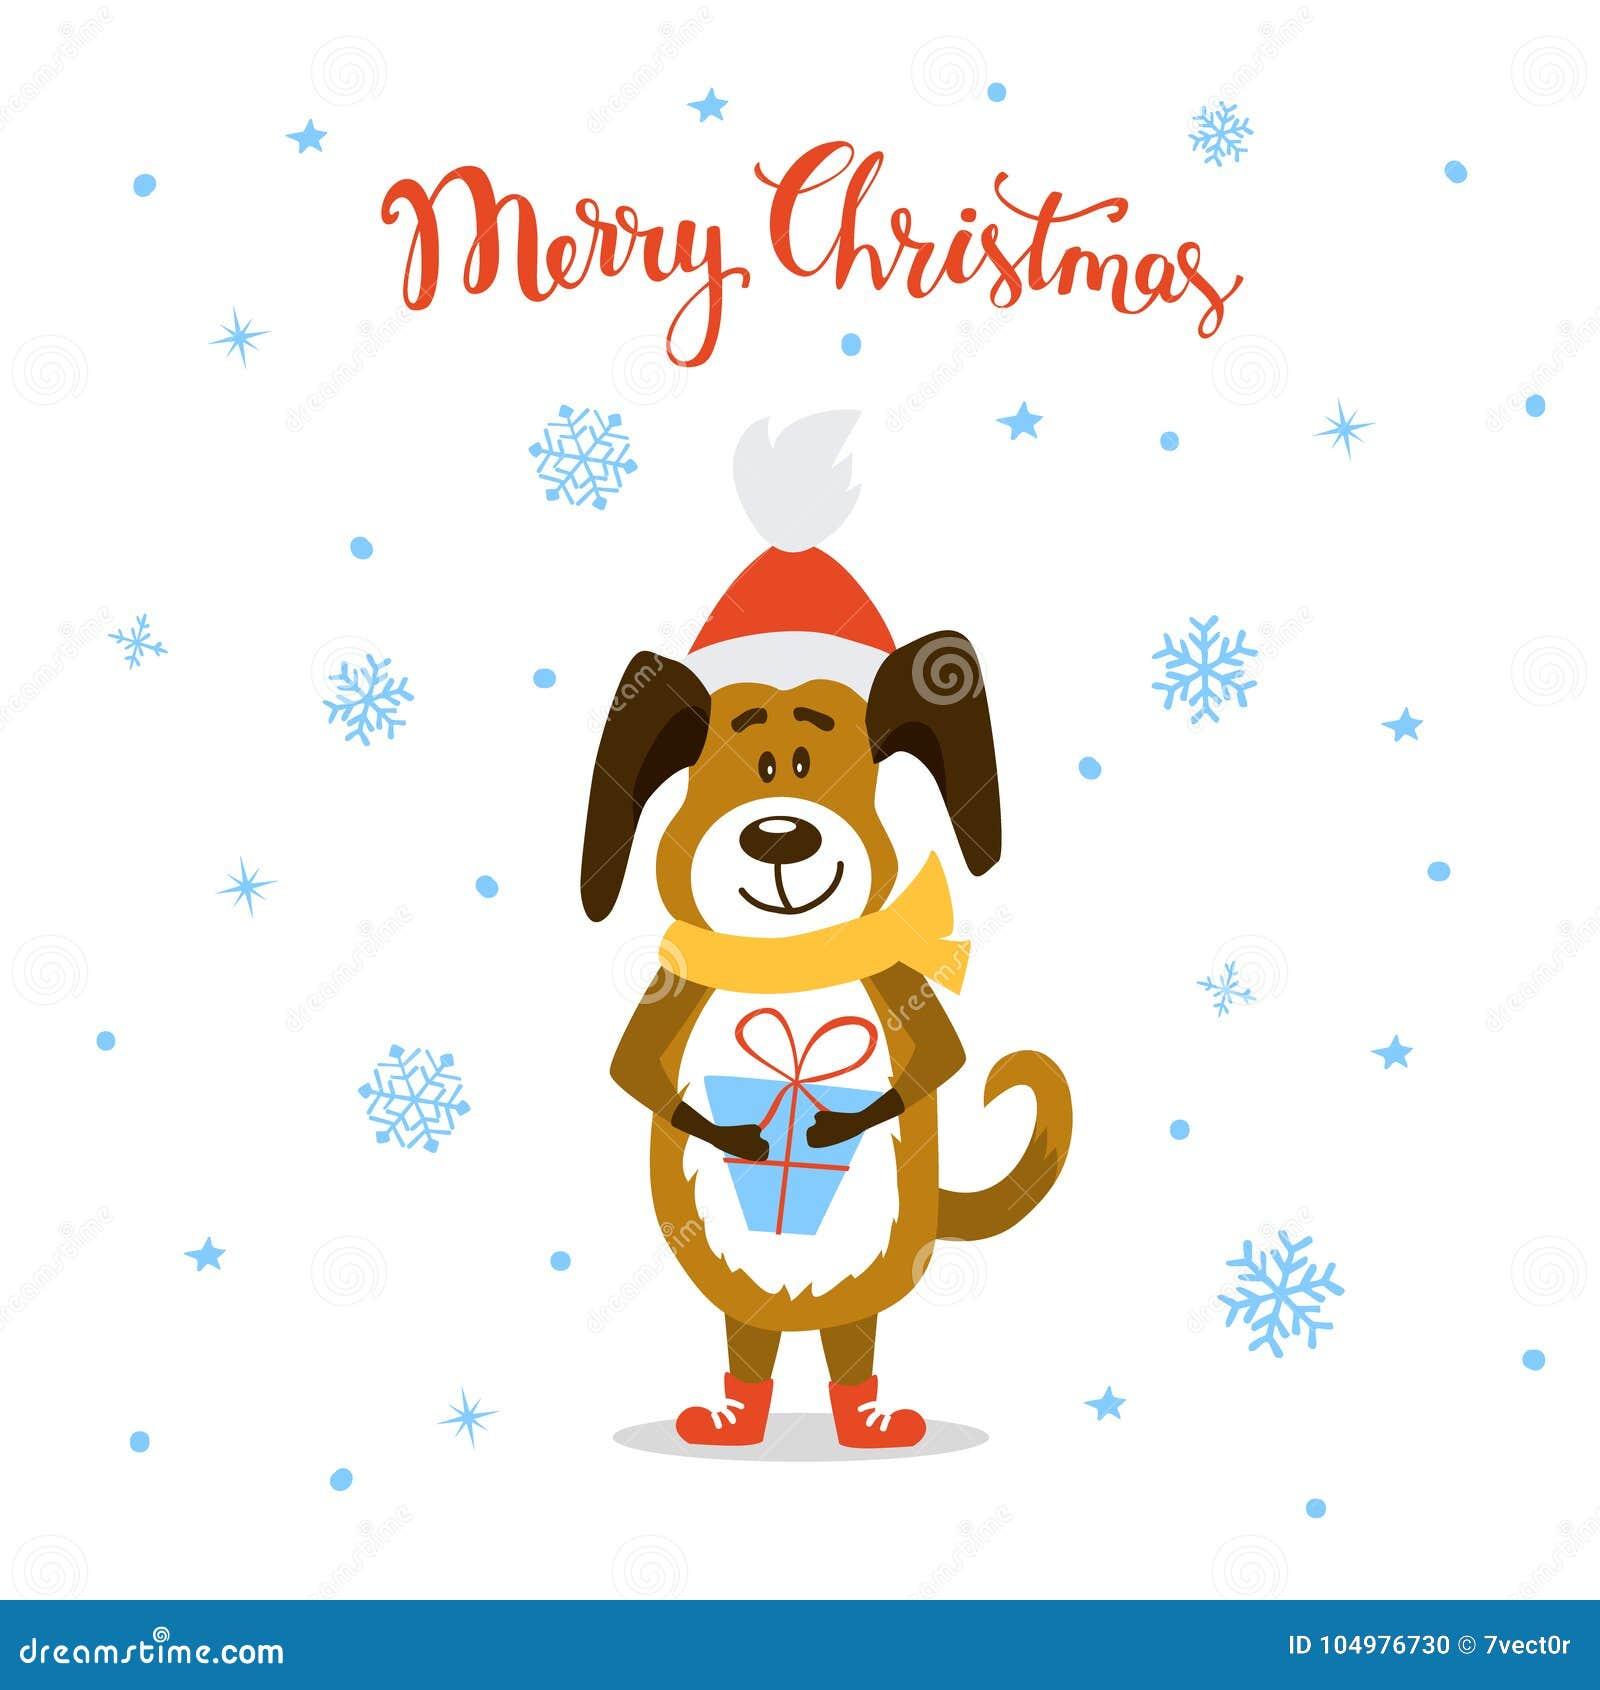 merry christmas happy new year 2018 cute funny cartoon dog